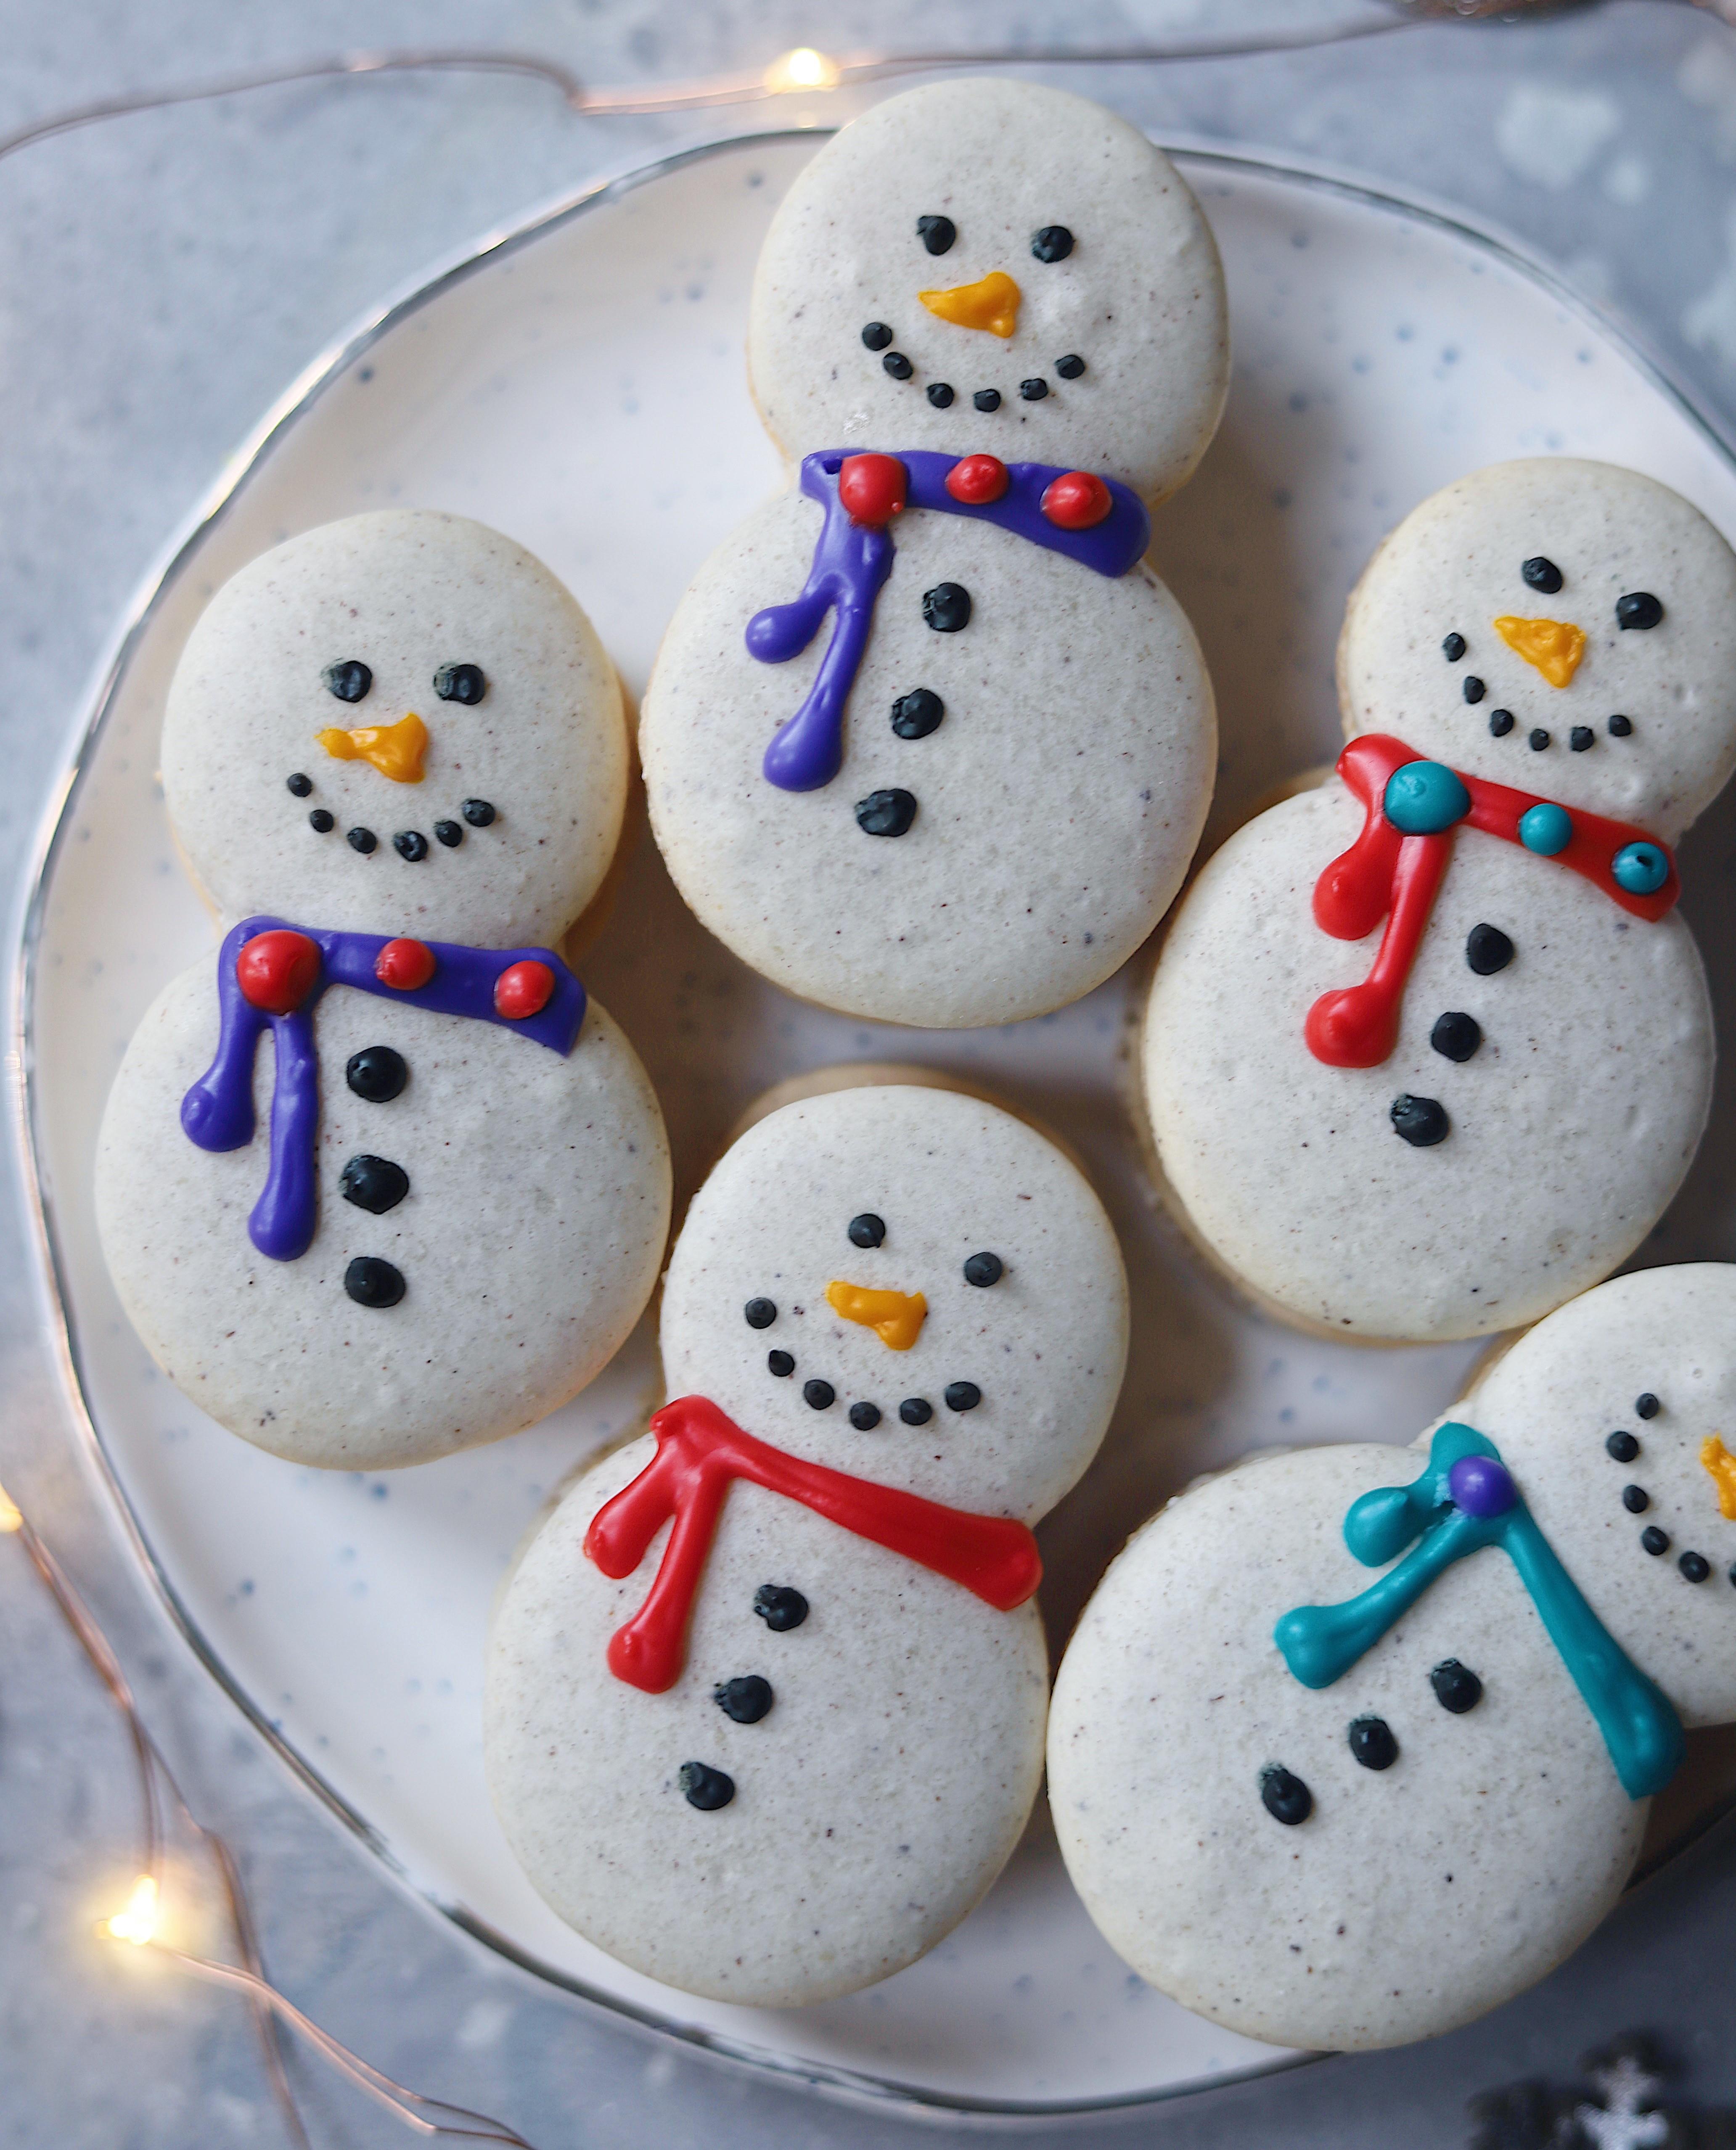 Snowman Macarons With Eggnog Buttercream Filling